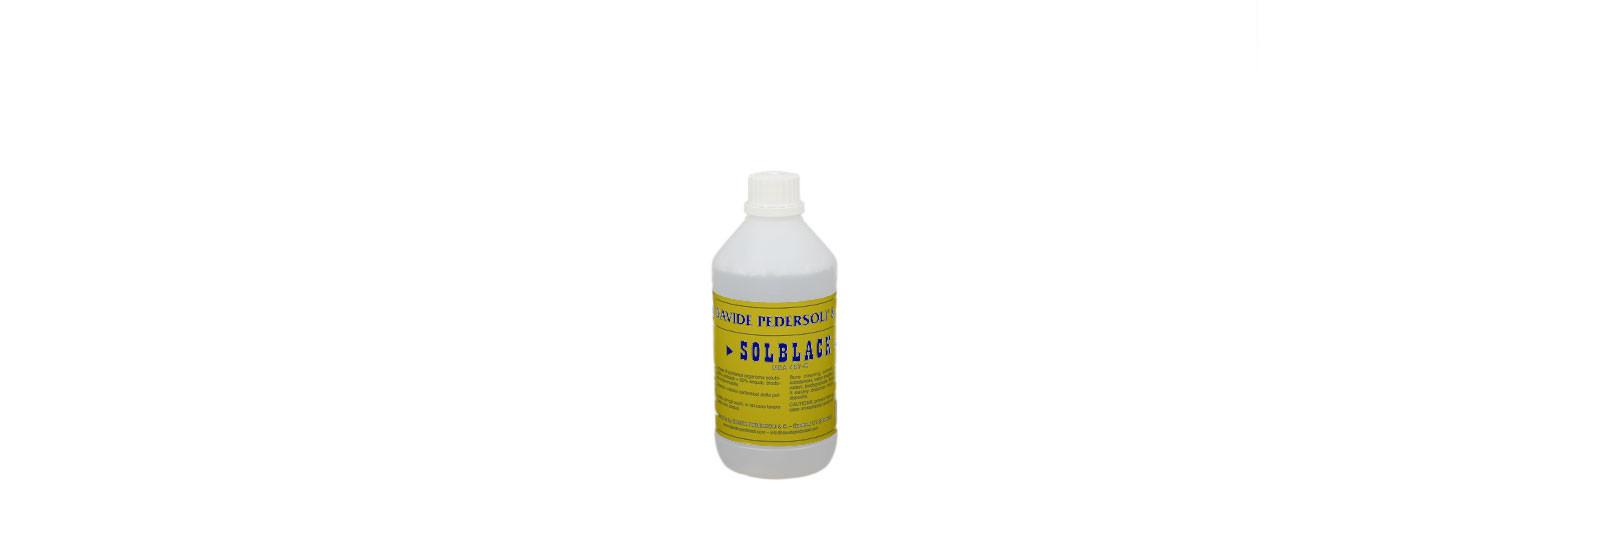 "Detergente ""Solblack"" 500 ml"